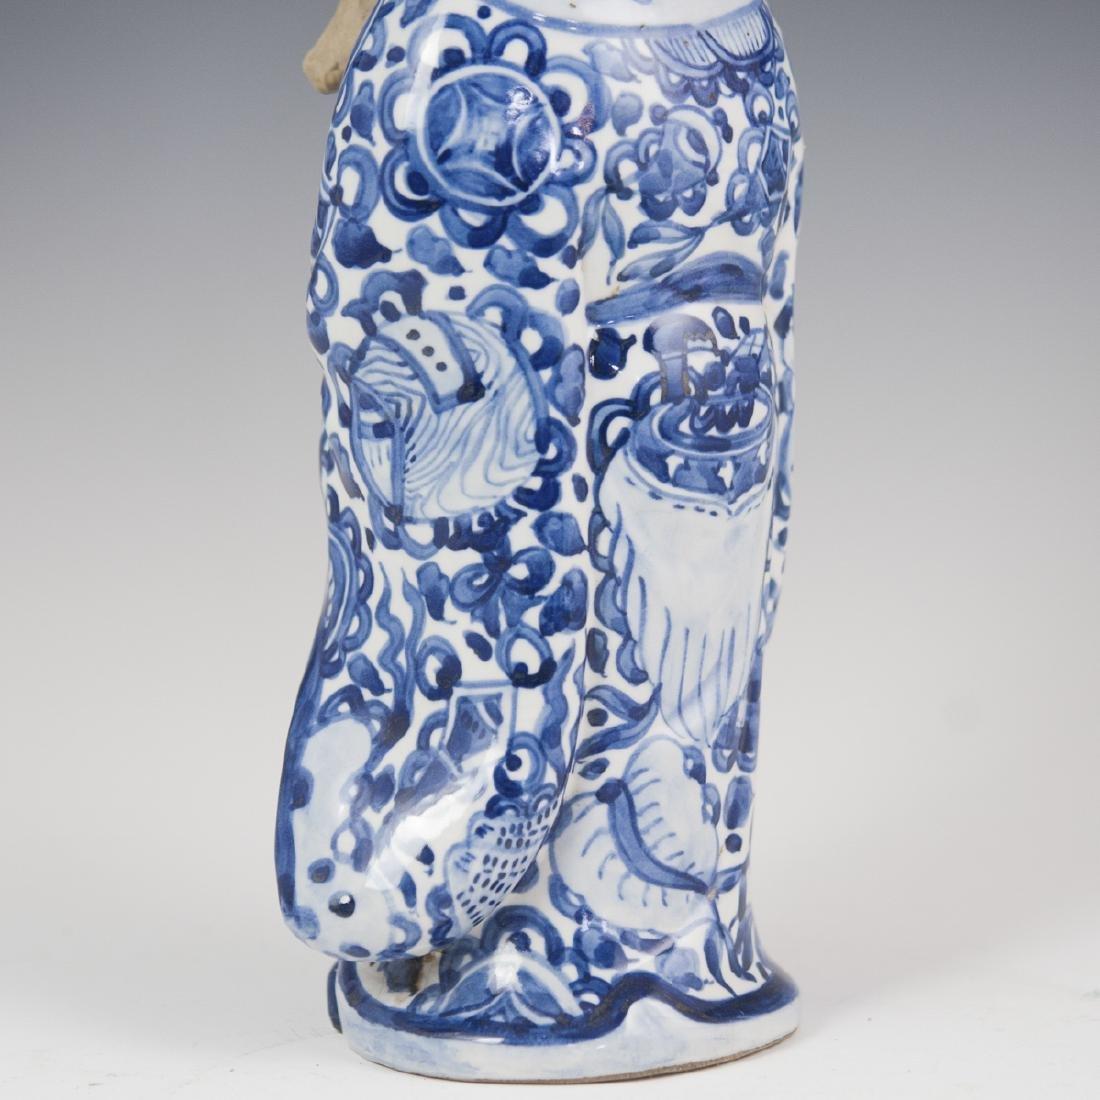 Chinese Glazed Pottery Shou Xing Figurine - 5